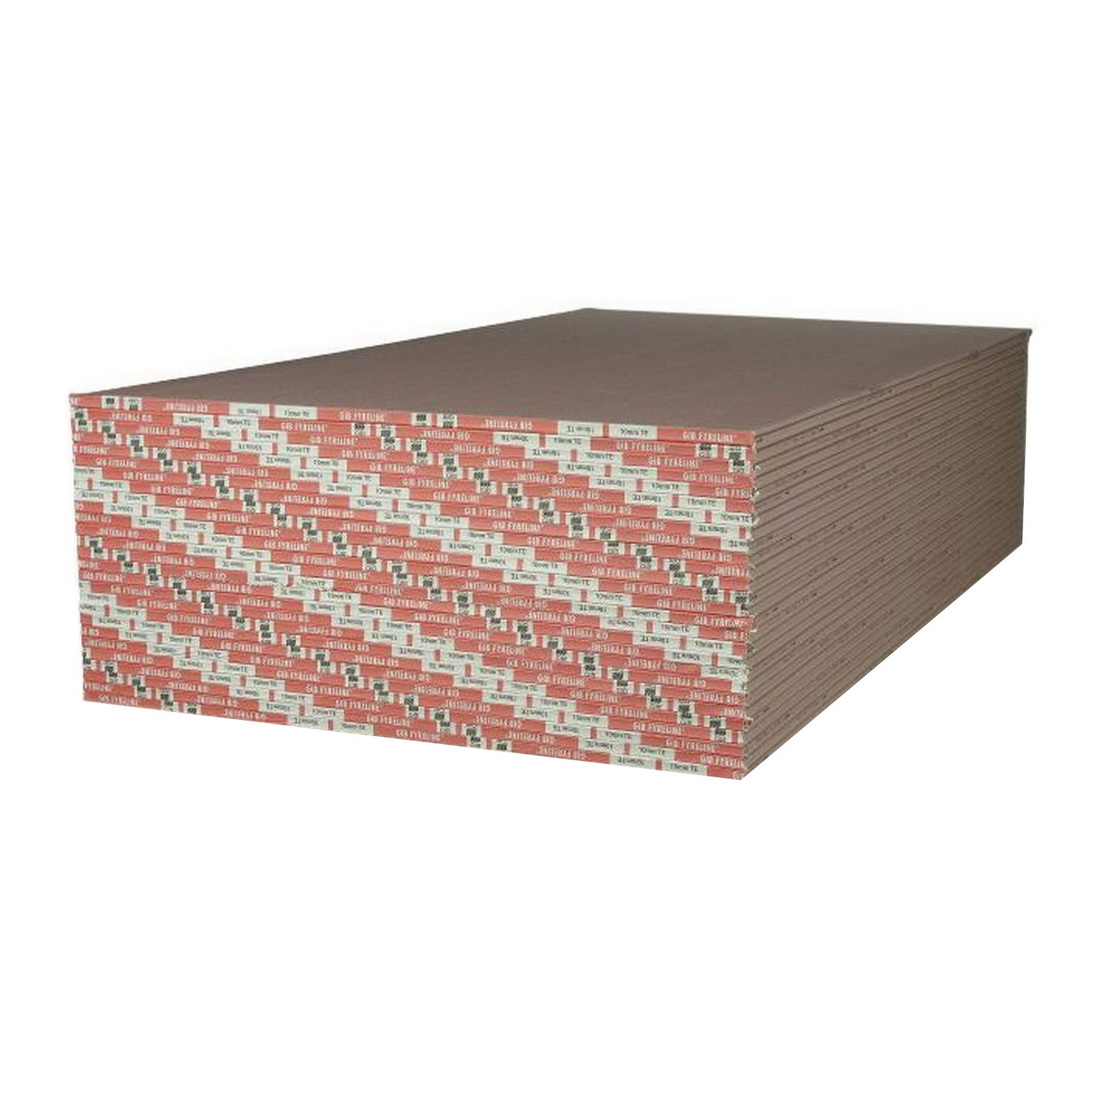 Fyreline Plasterboard 2700 x 1200 x 10mm 11673